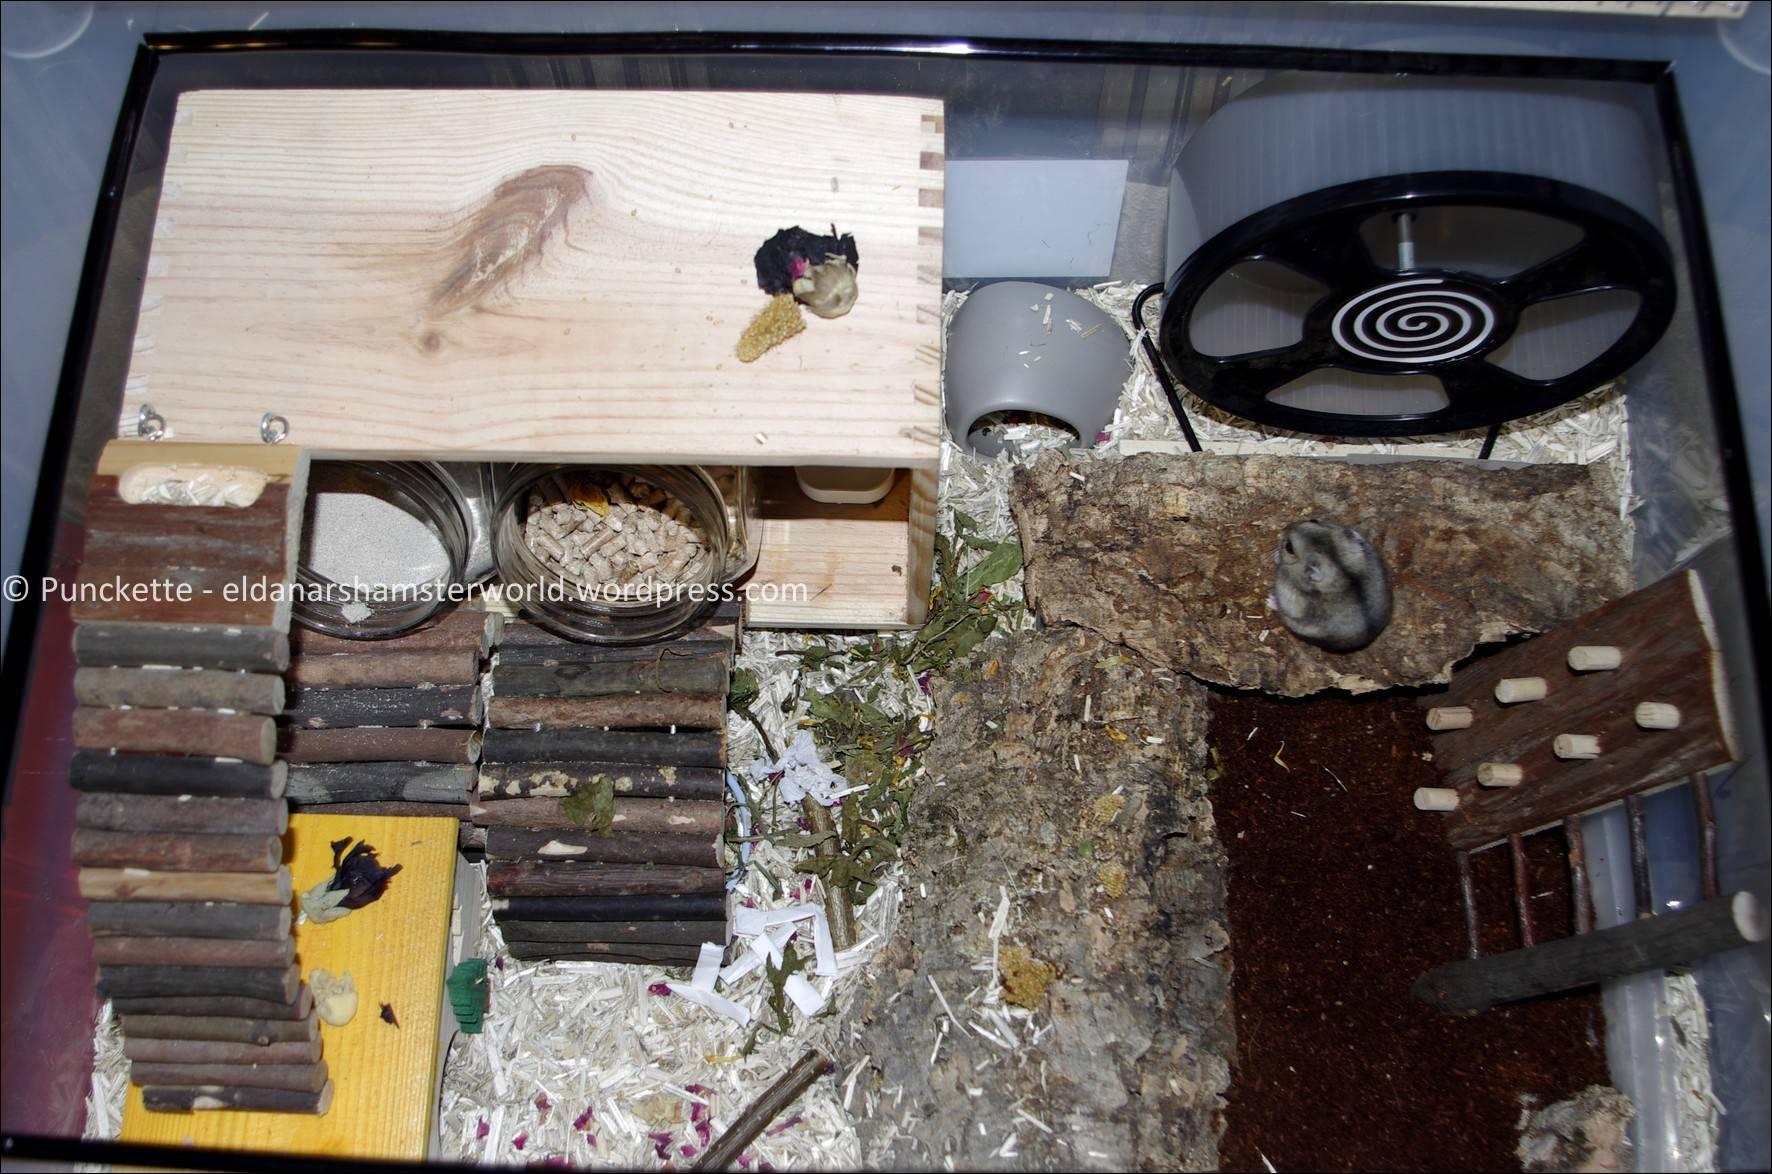 1000 images about hamster on pinterest hamster cages for Hamster bin cage tutorial